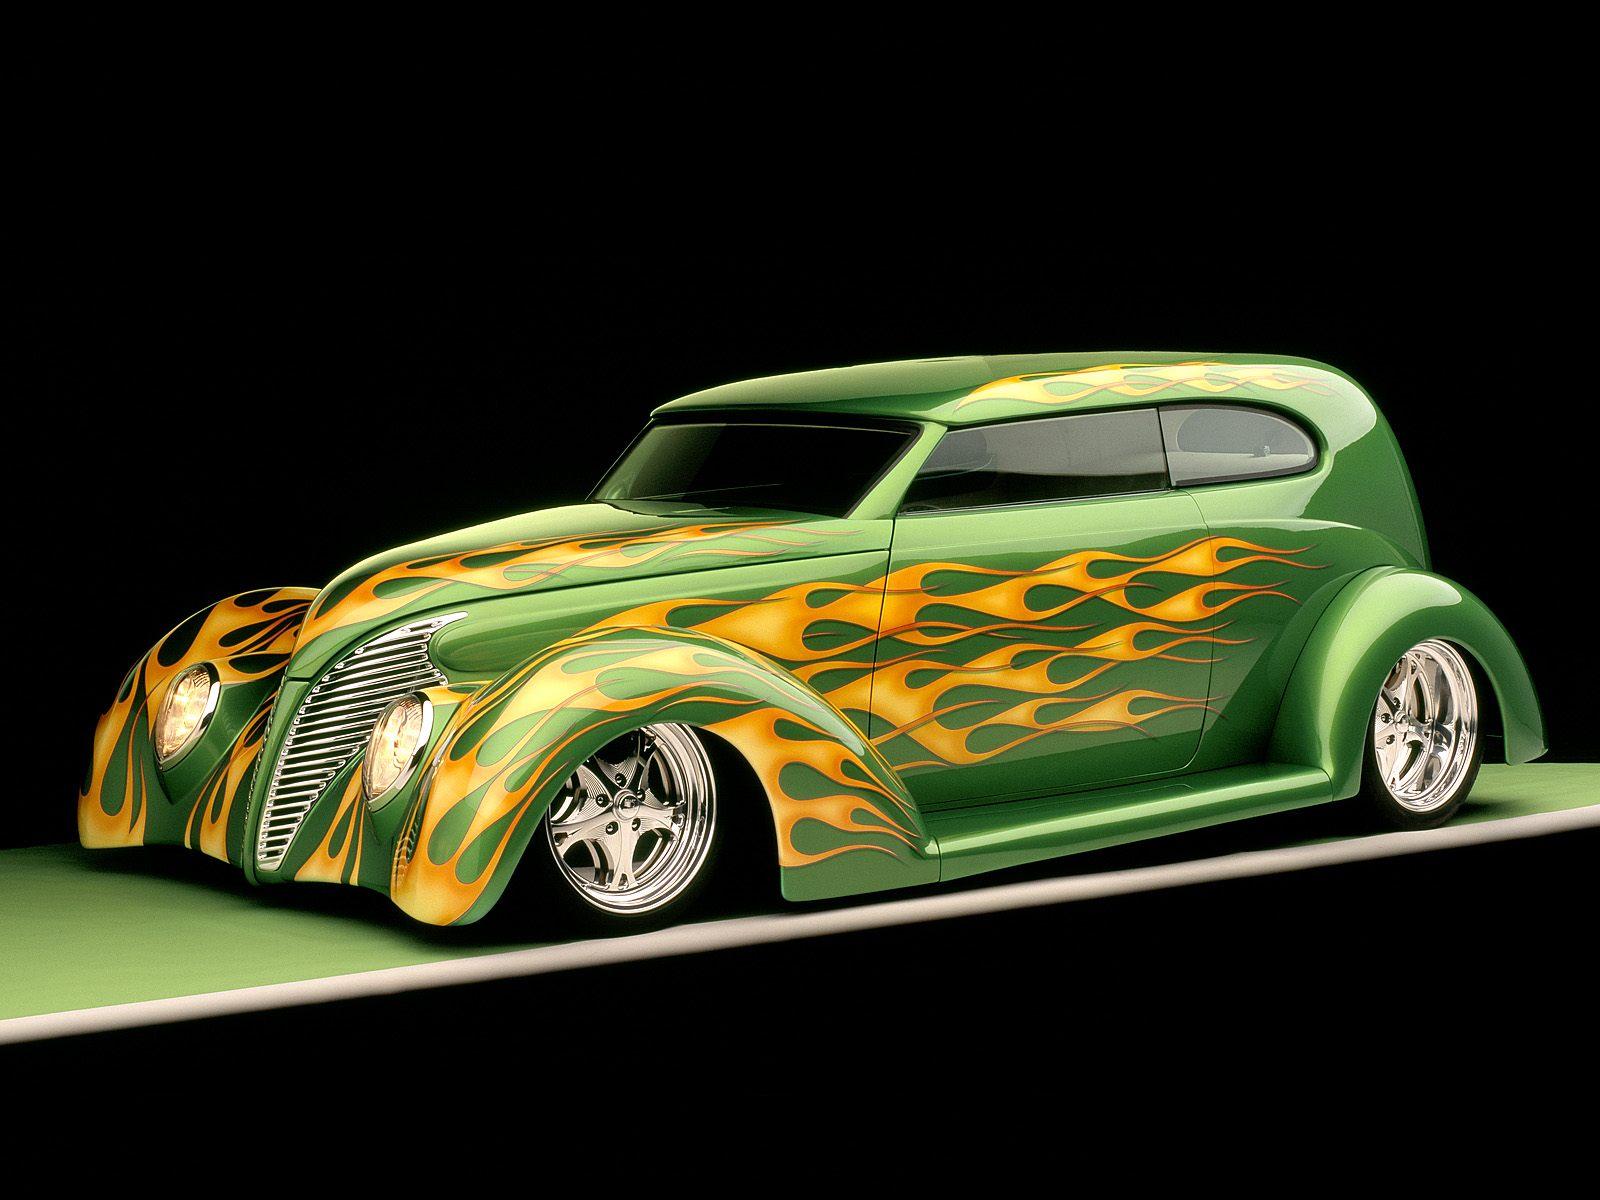 Cars Wallpaper 134 Wallpapers Desktop Wallpapers HD 1600x1200